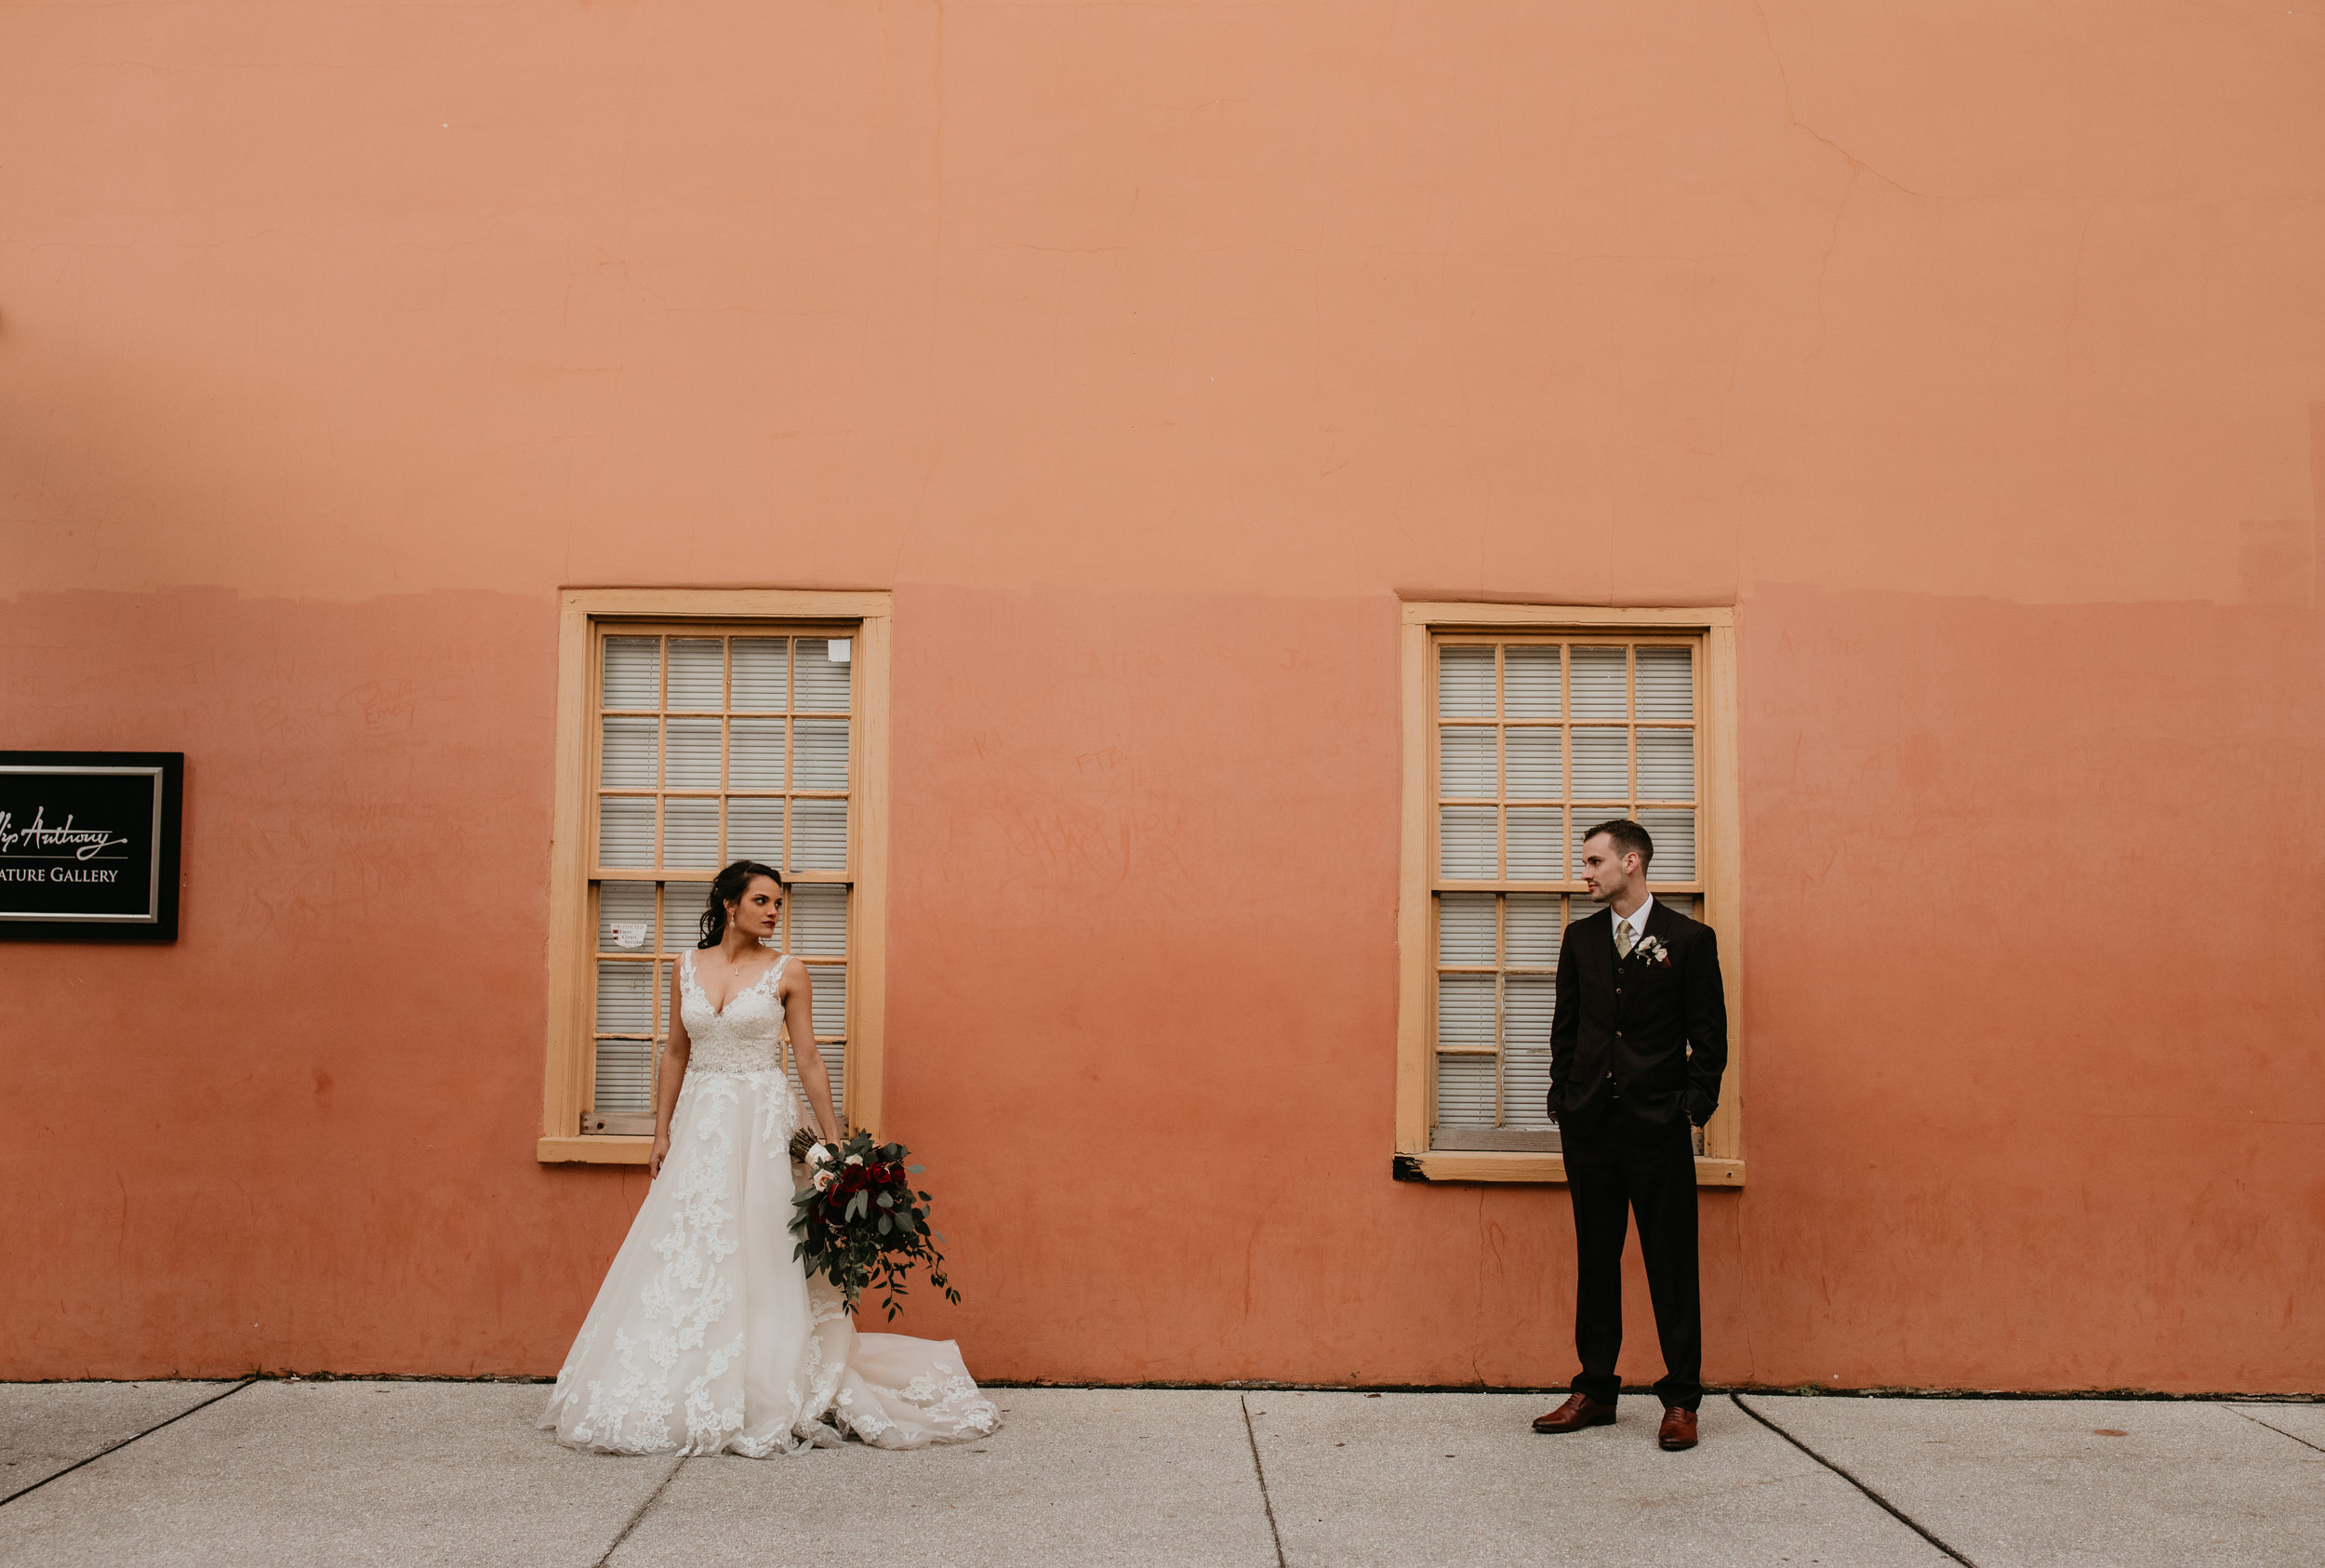 St Augustine Florida-Wedding-Katelyn and Kevin 44.JPG